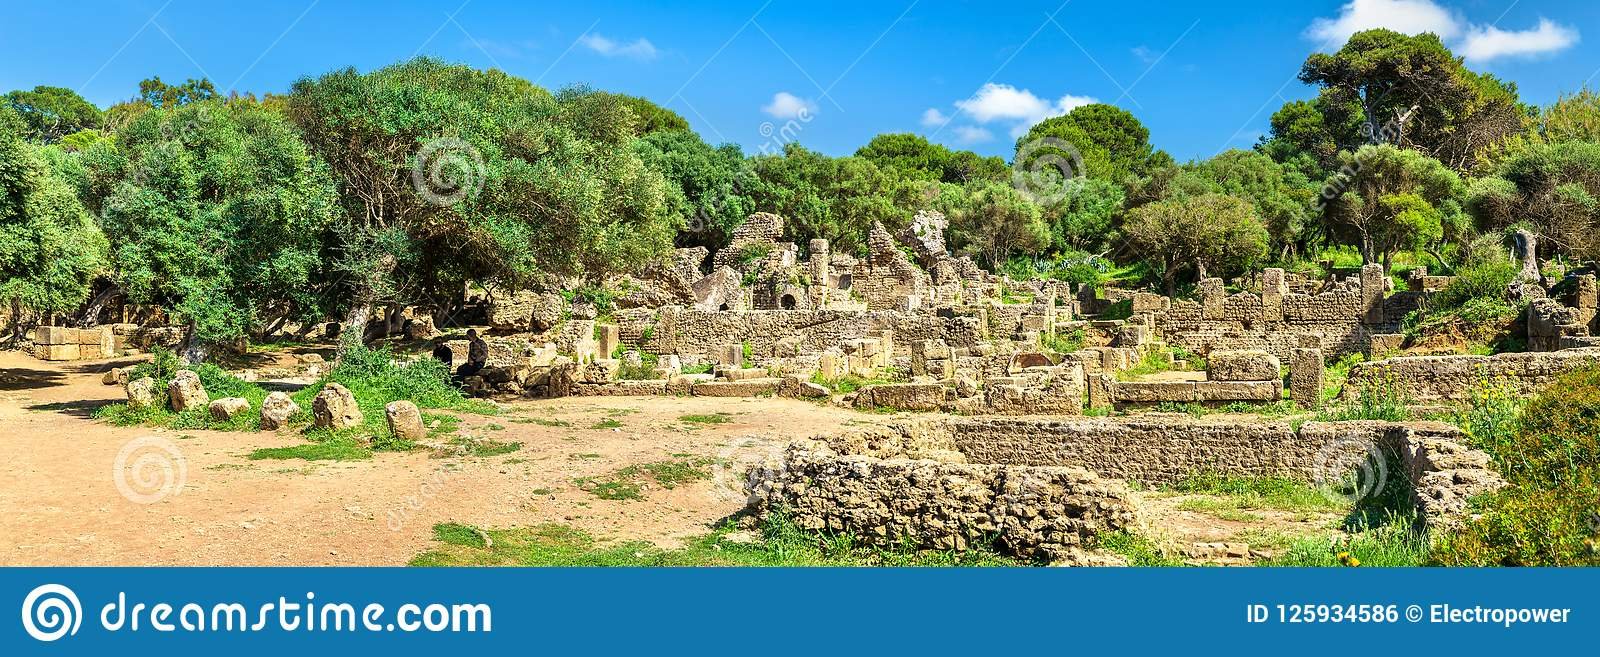 Tipasa废墟,一罗马colonia在阿尔及利亚,北非